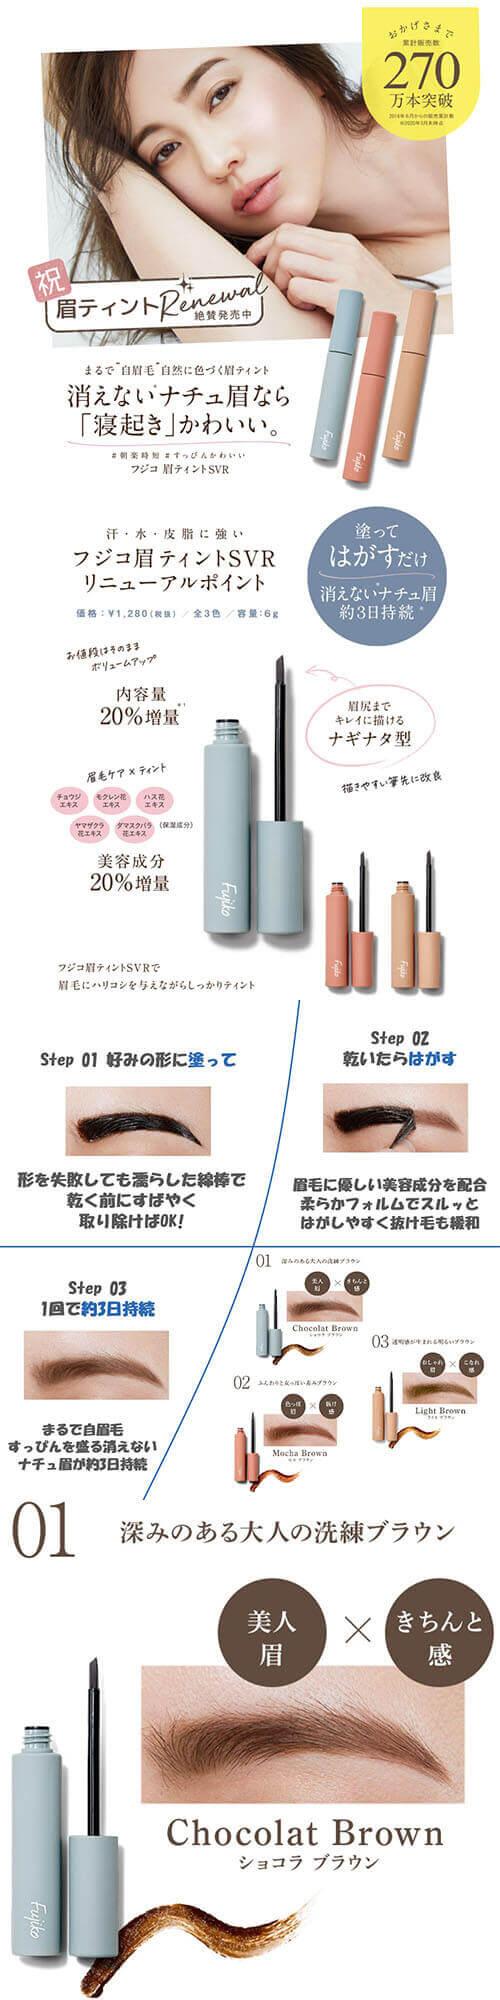 Fujiko眉ティント【01 ショコラブラウン】